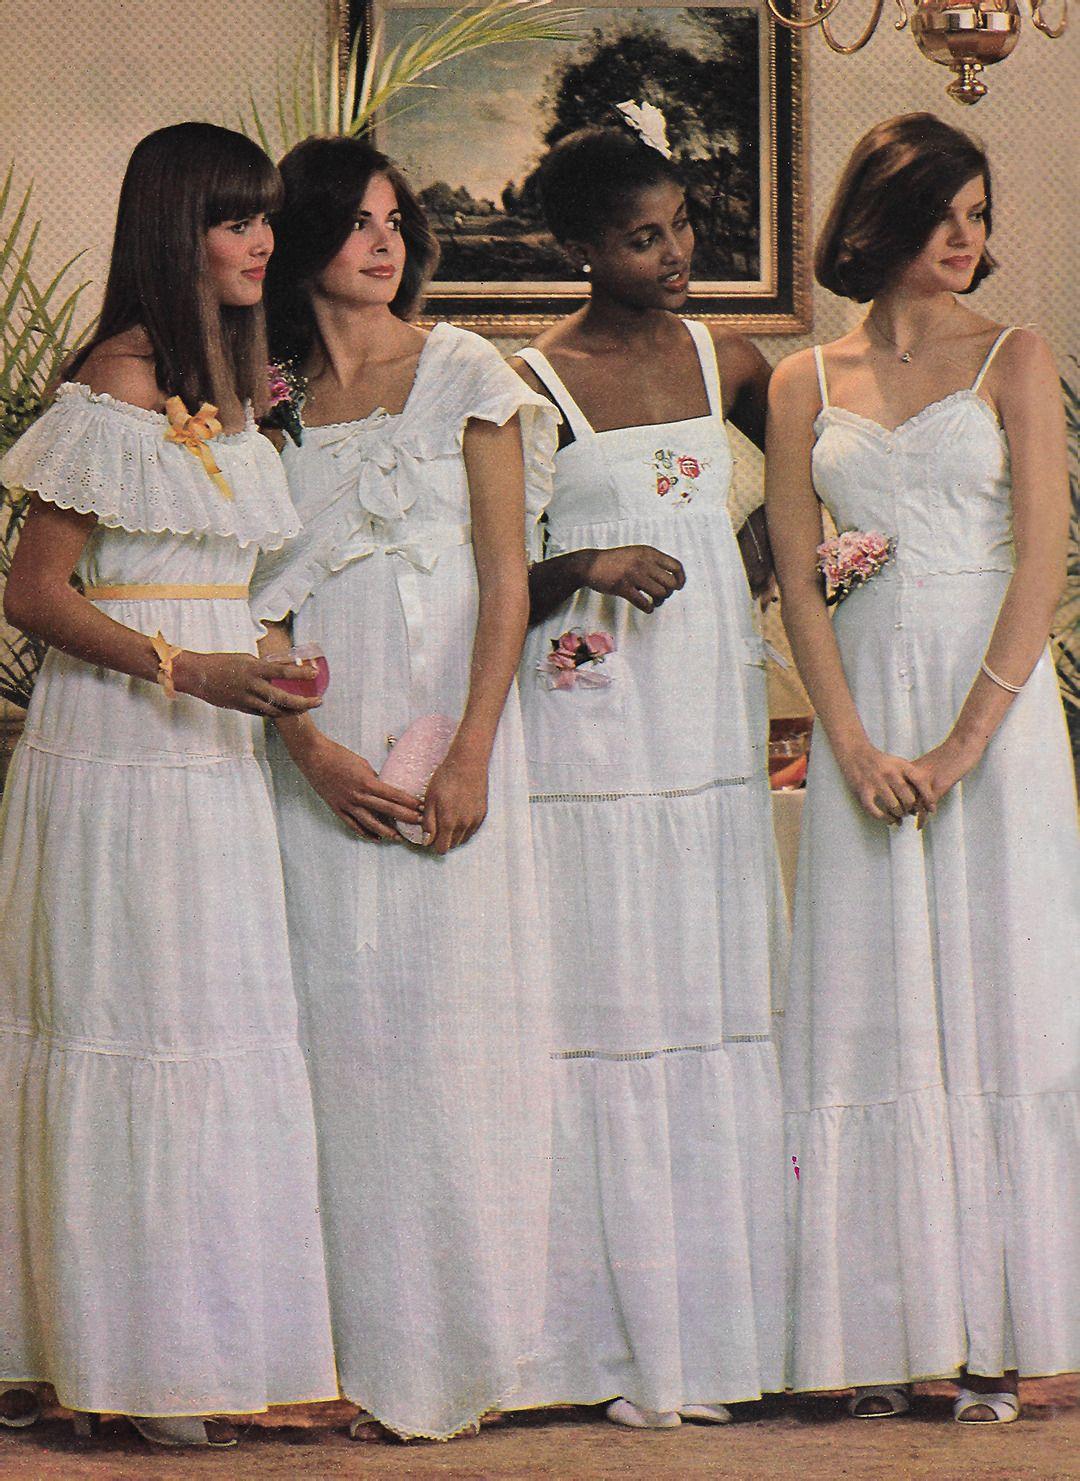 1970s Fashion Real Romantics Let Longdresses Set The Mood Byron S Muse Prom Dresses Vintage 70s Vintage Fashion Vintage Outfits [ 1481 x 1080 Pixel ]